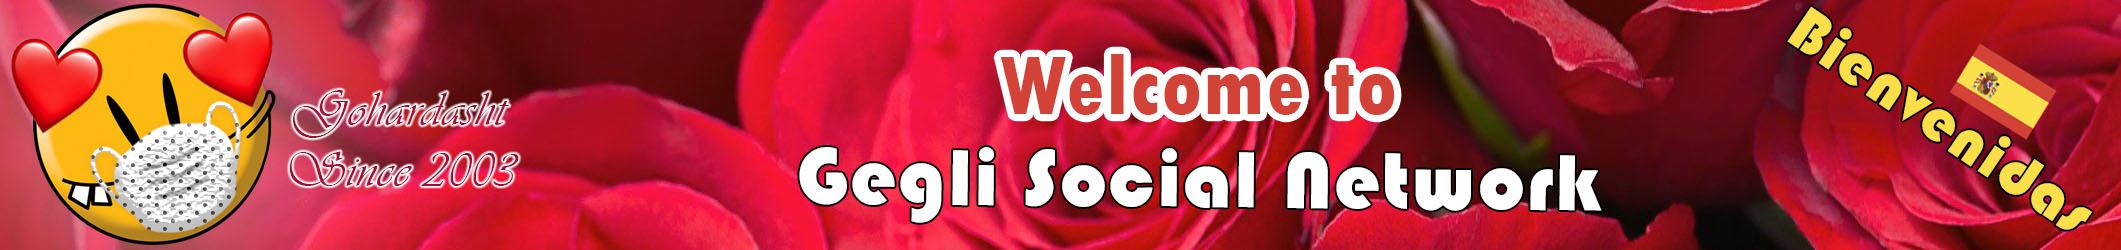 Gegli Social Network